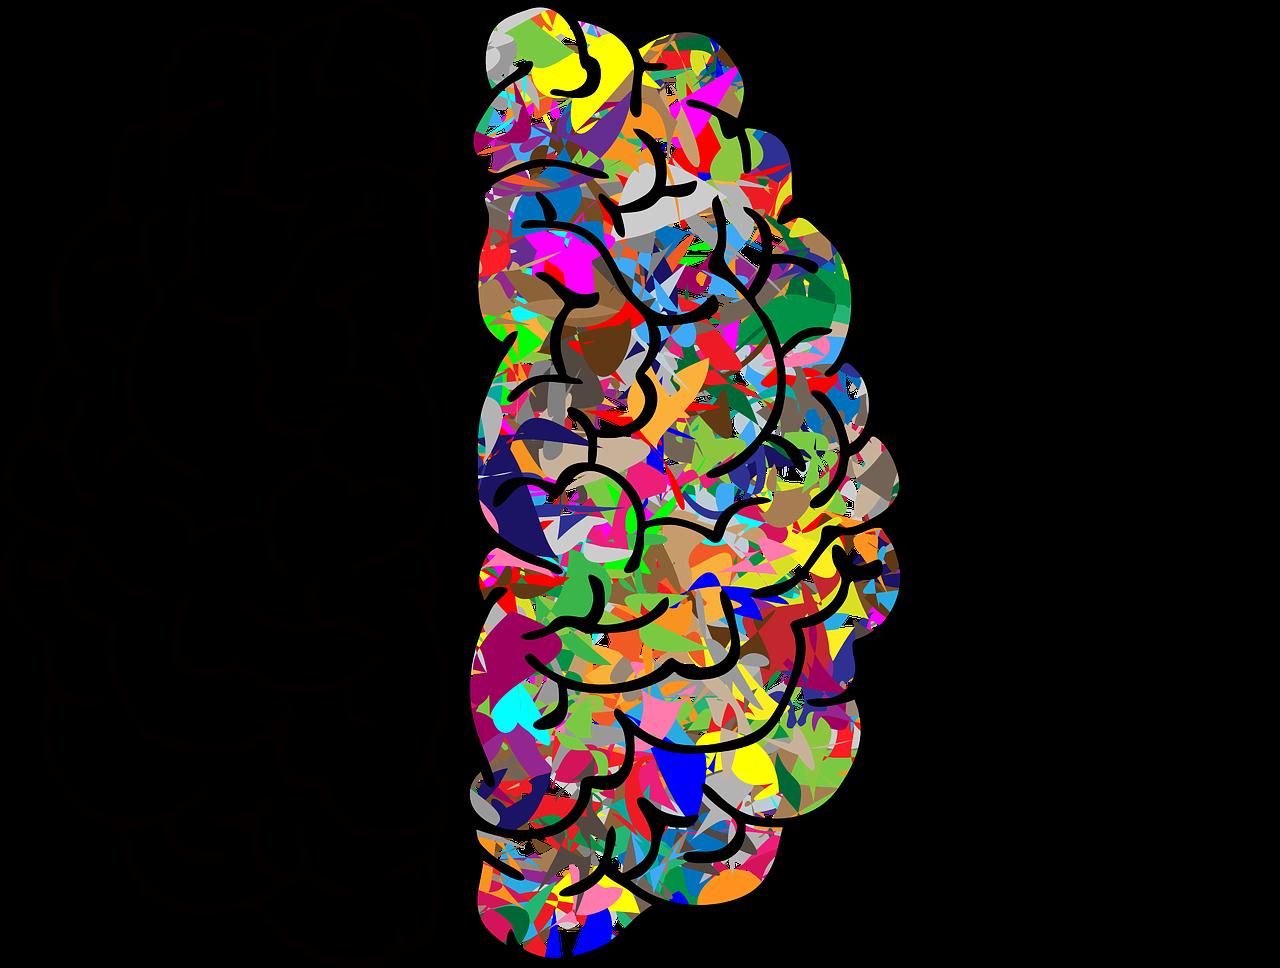 brain-2750415_1280